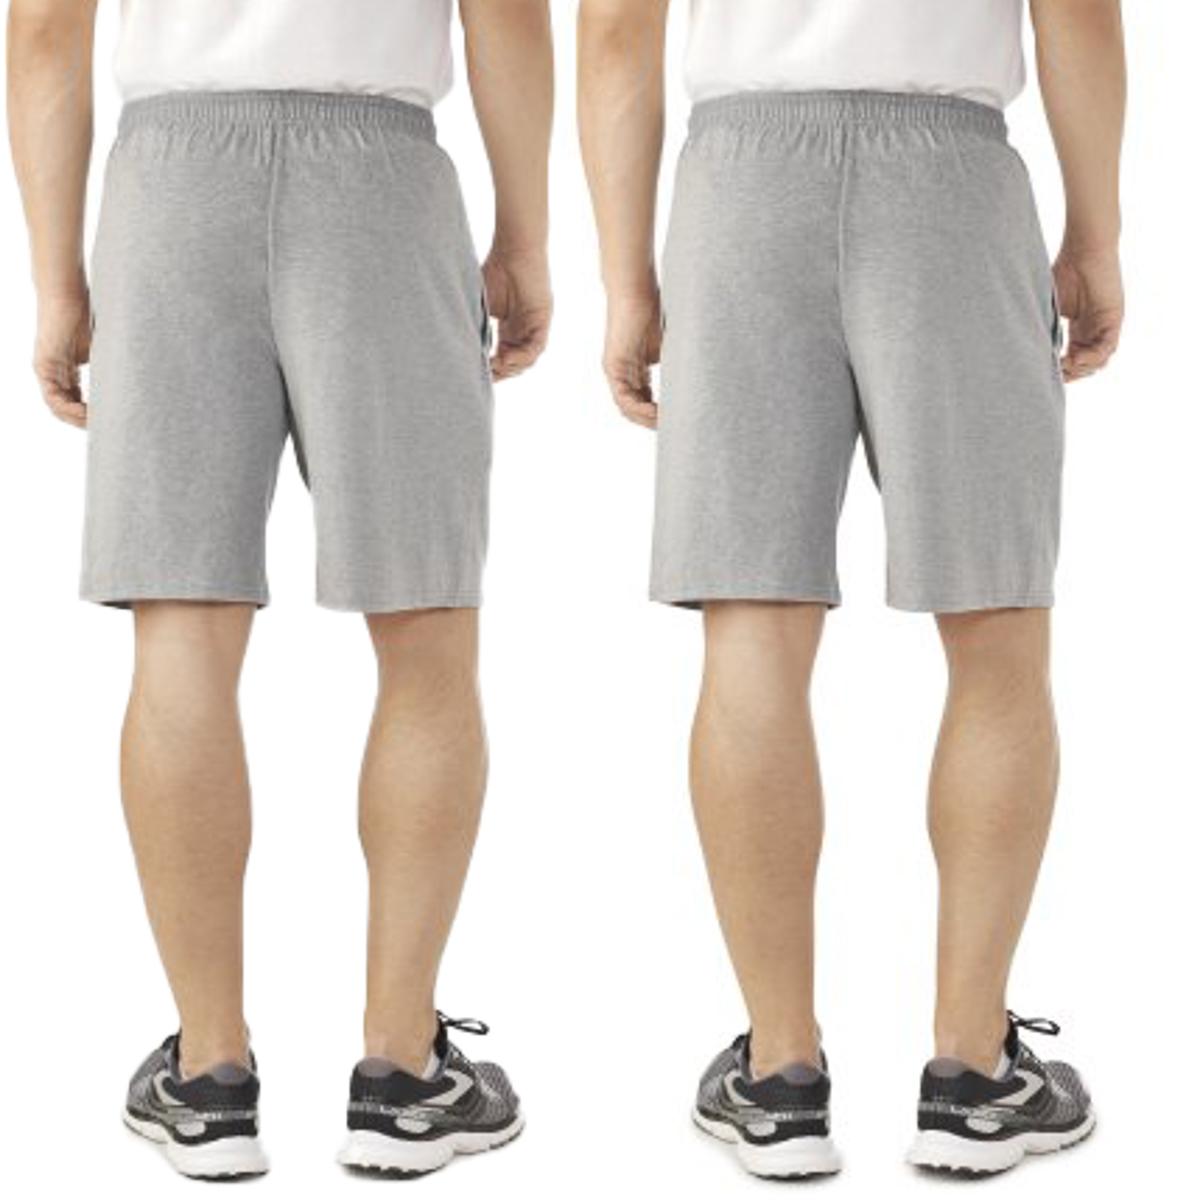 9 inseam shorts